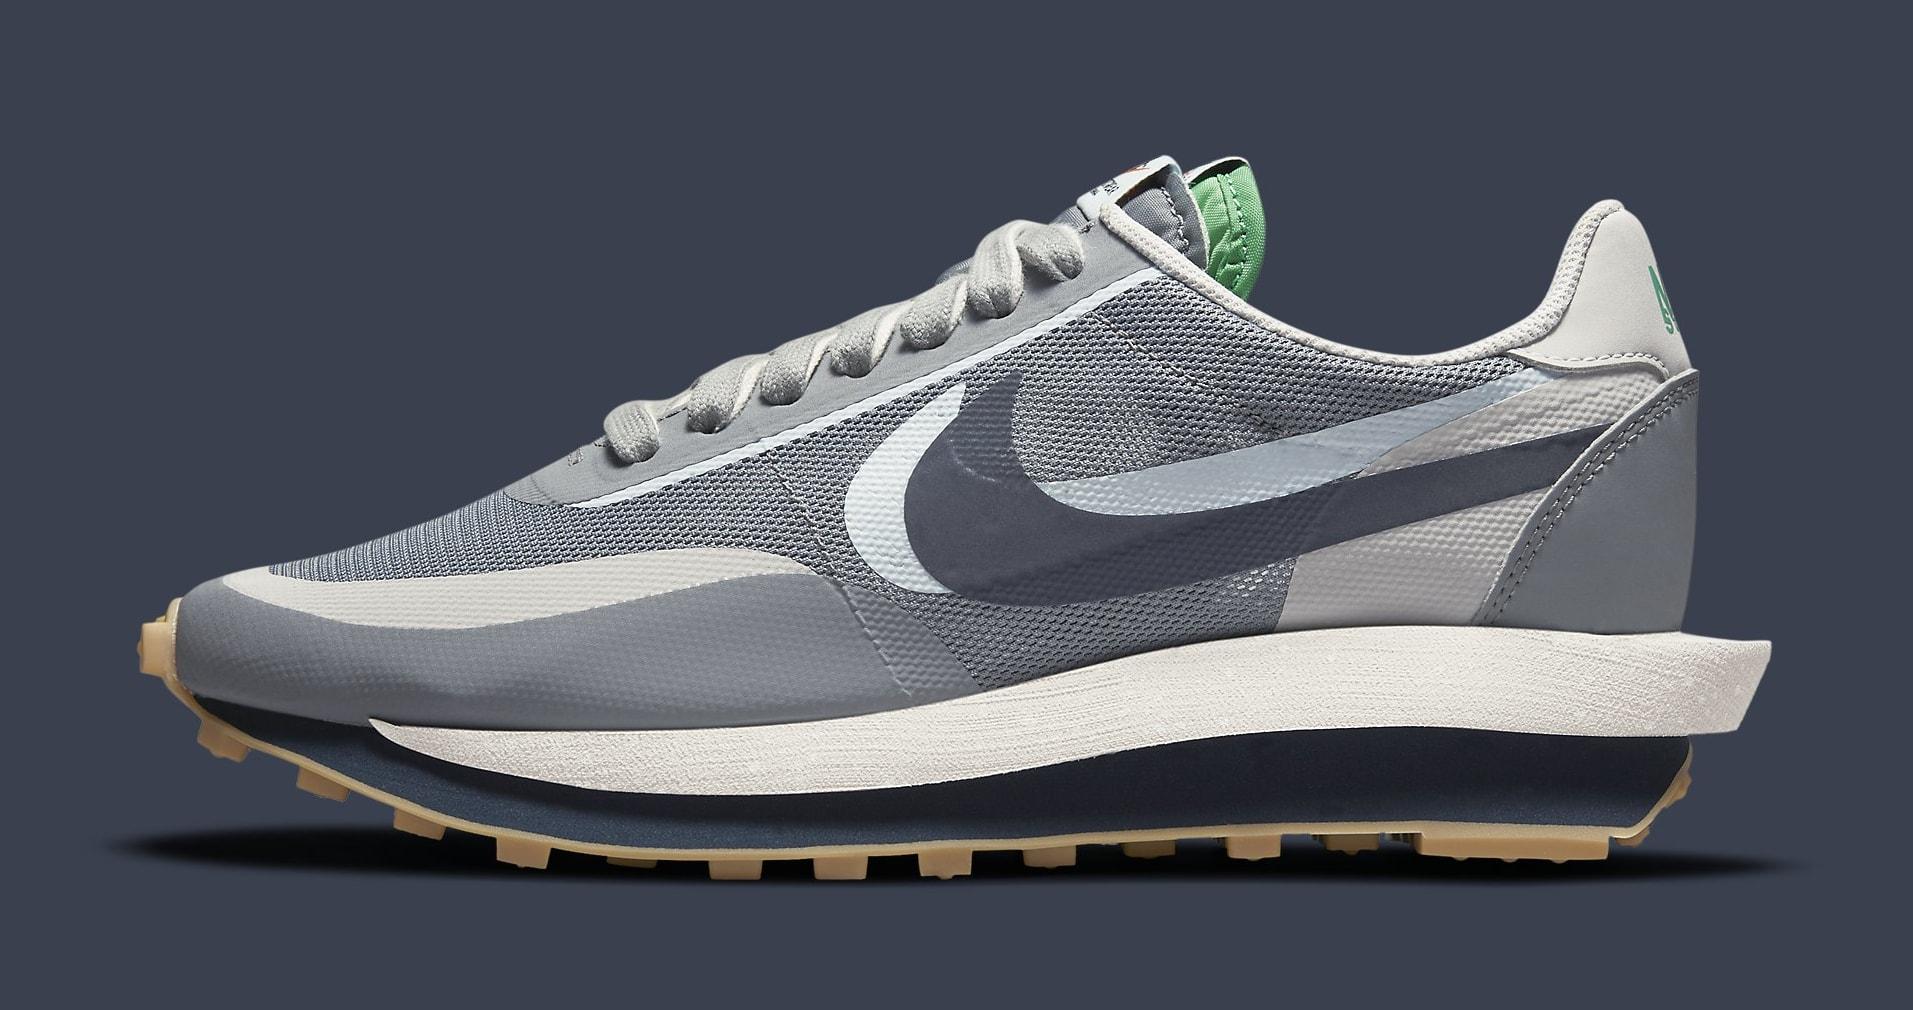 Clot x Sacai x Nike LDWaffle 'Cool Grey' DH3114-001 Lateral